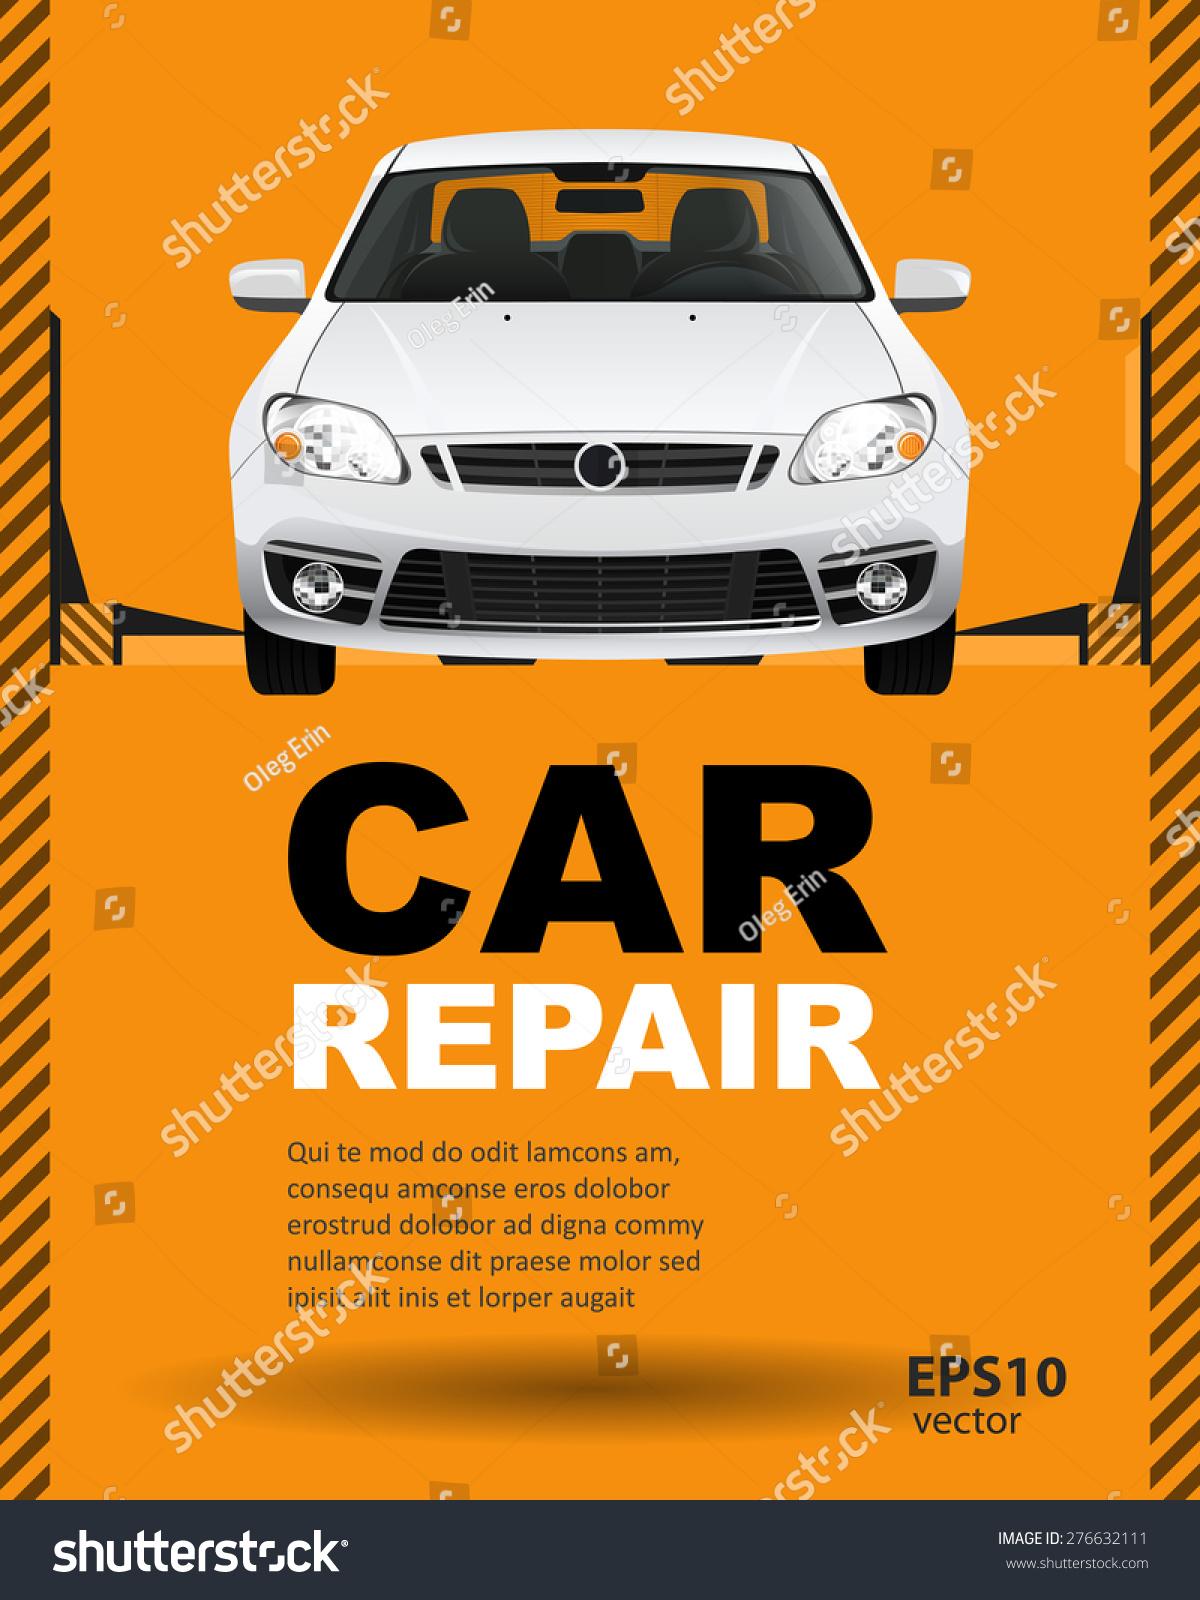 Car Auto Repair Lift Template Layout Stock Vector 276632111 ...